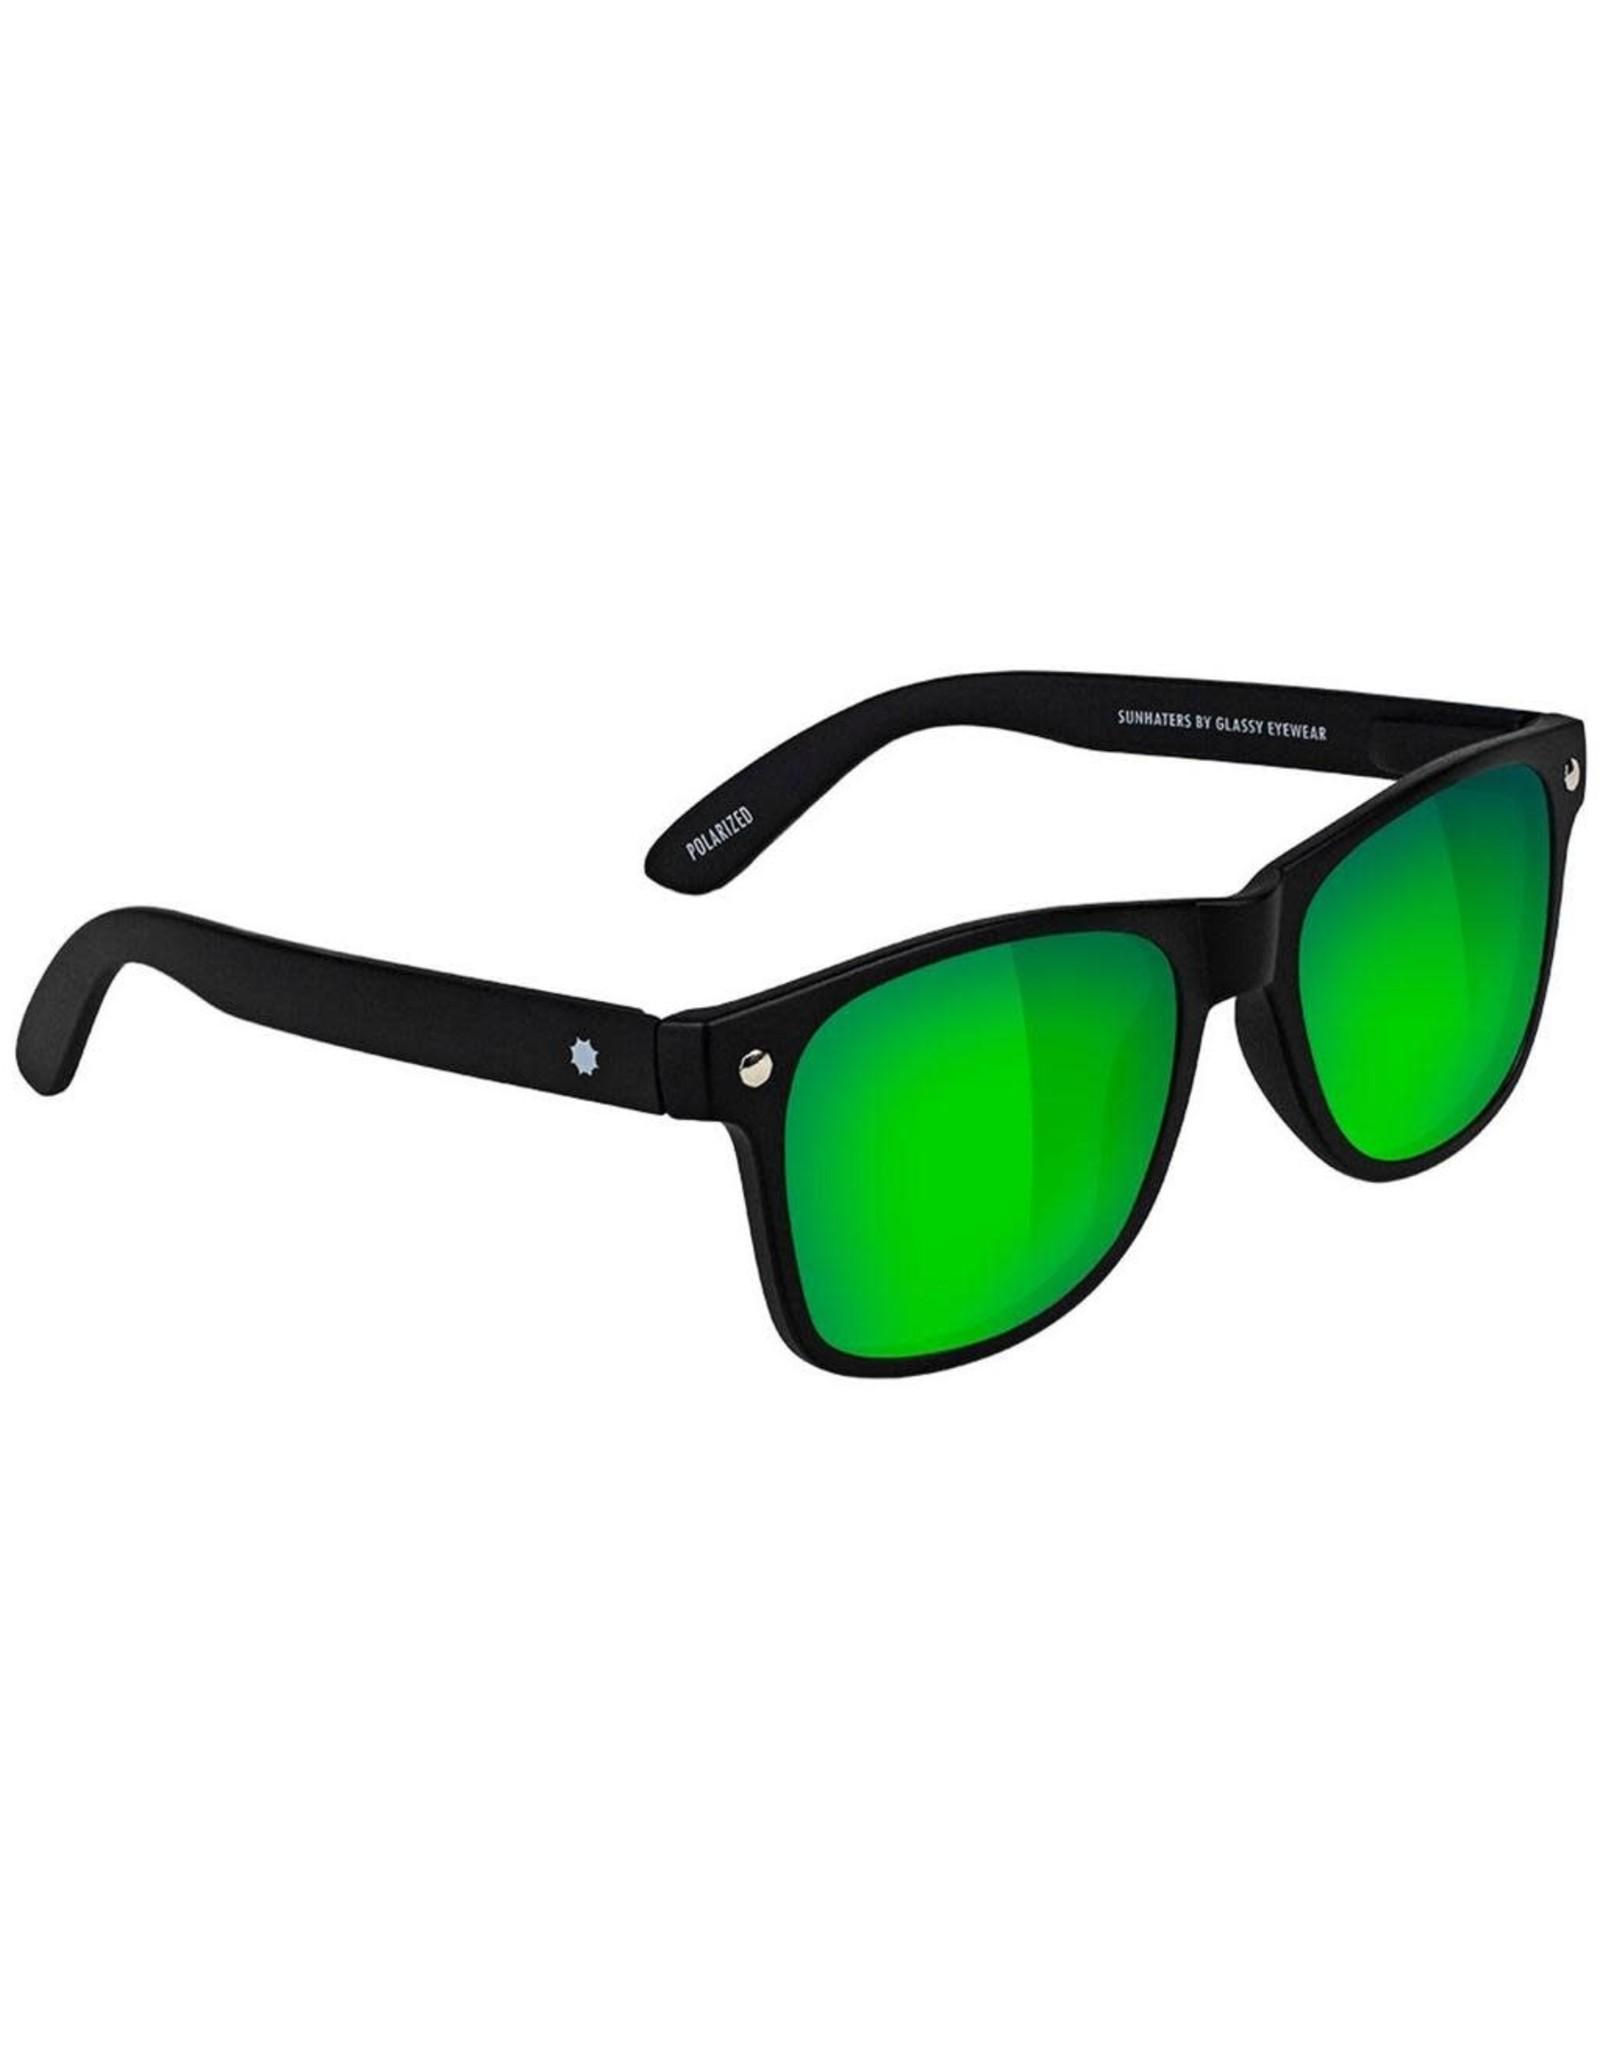 Glassy - Lunette soleil homme leonard polarized matte black/green mirror